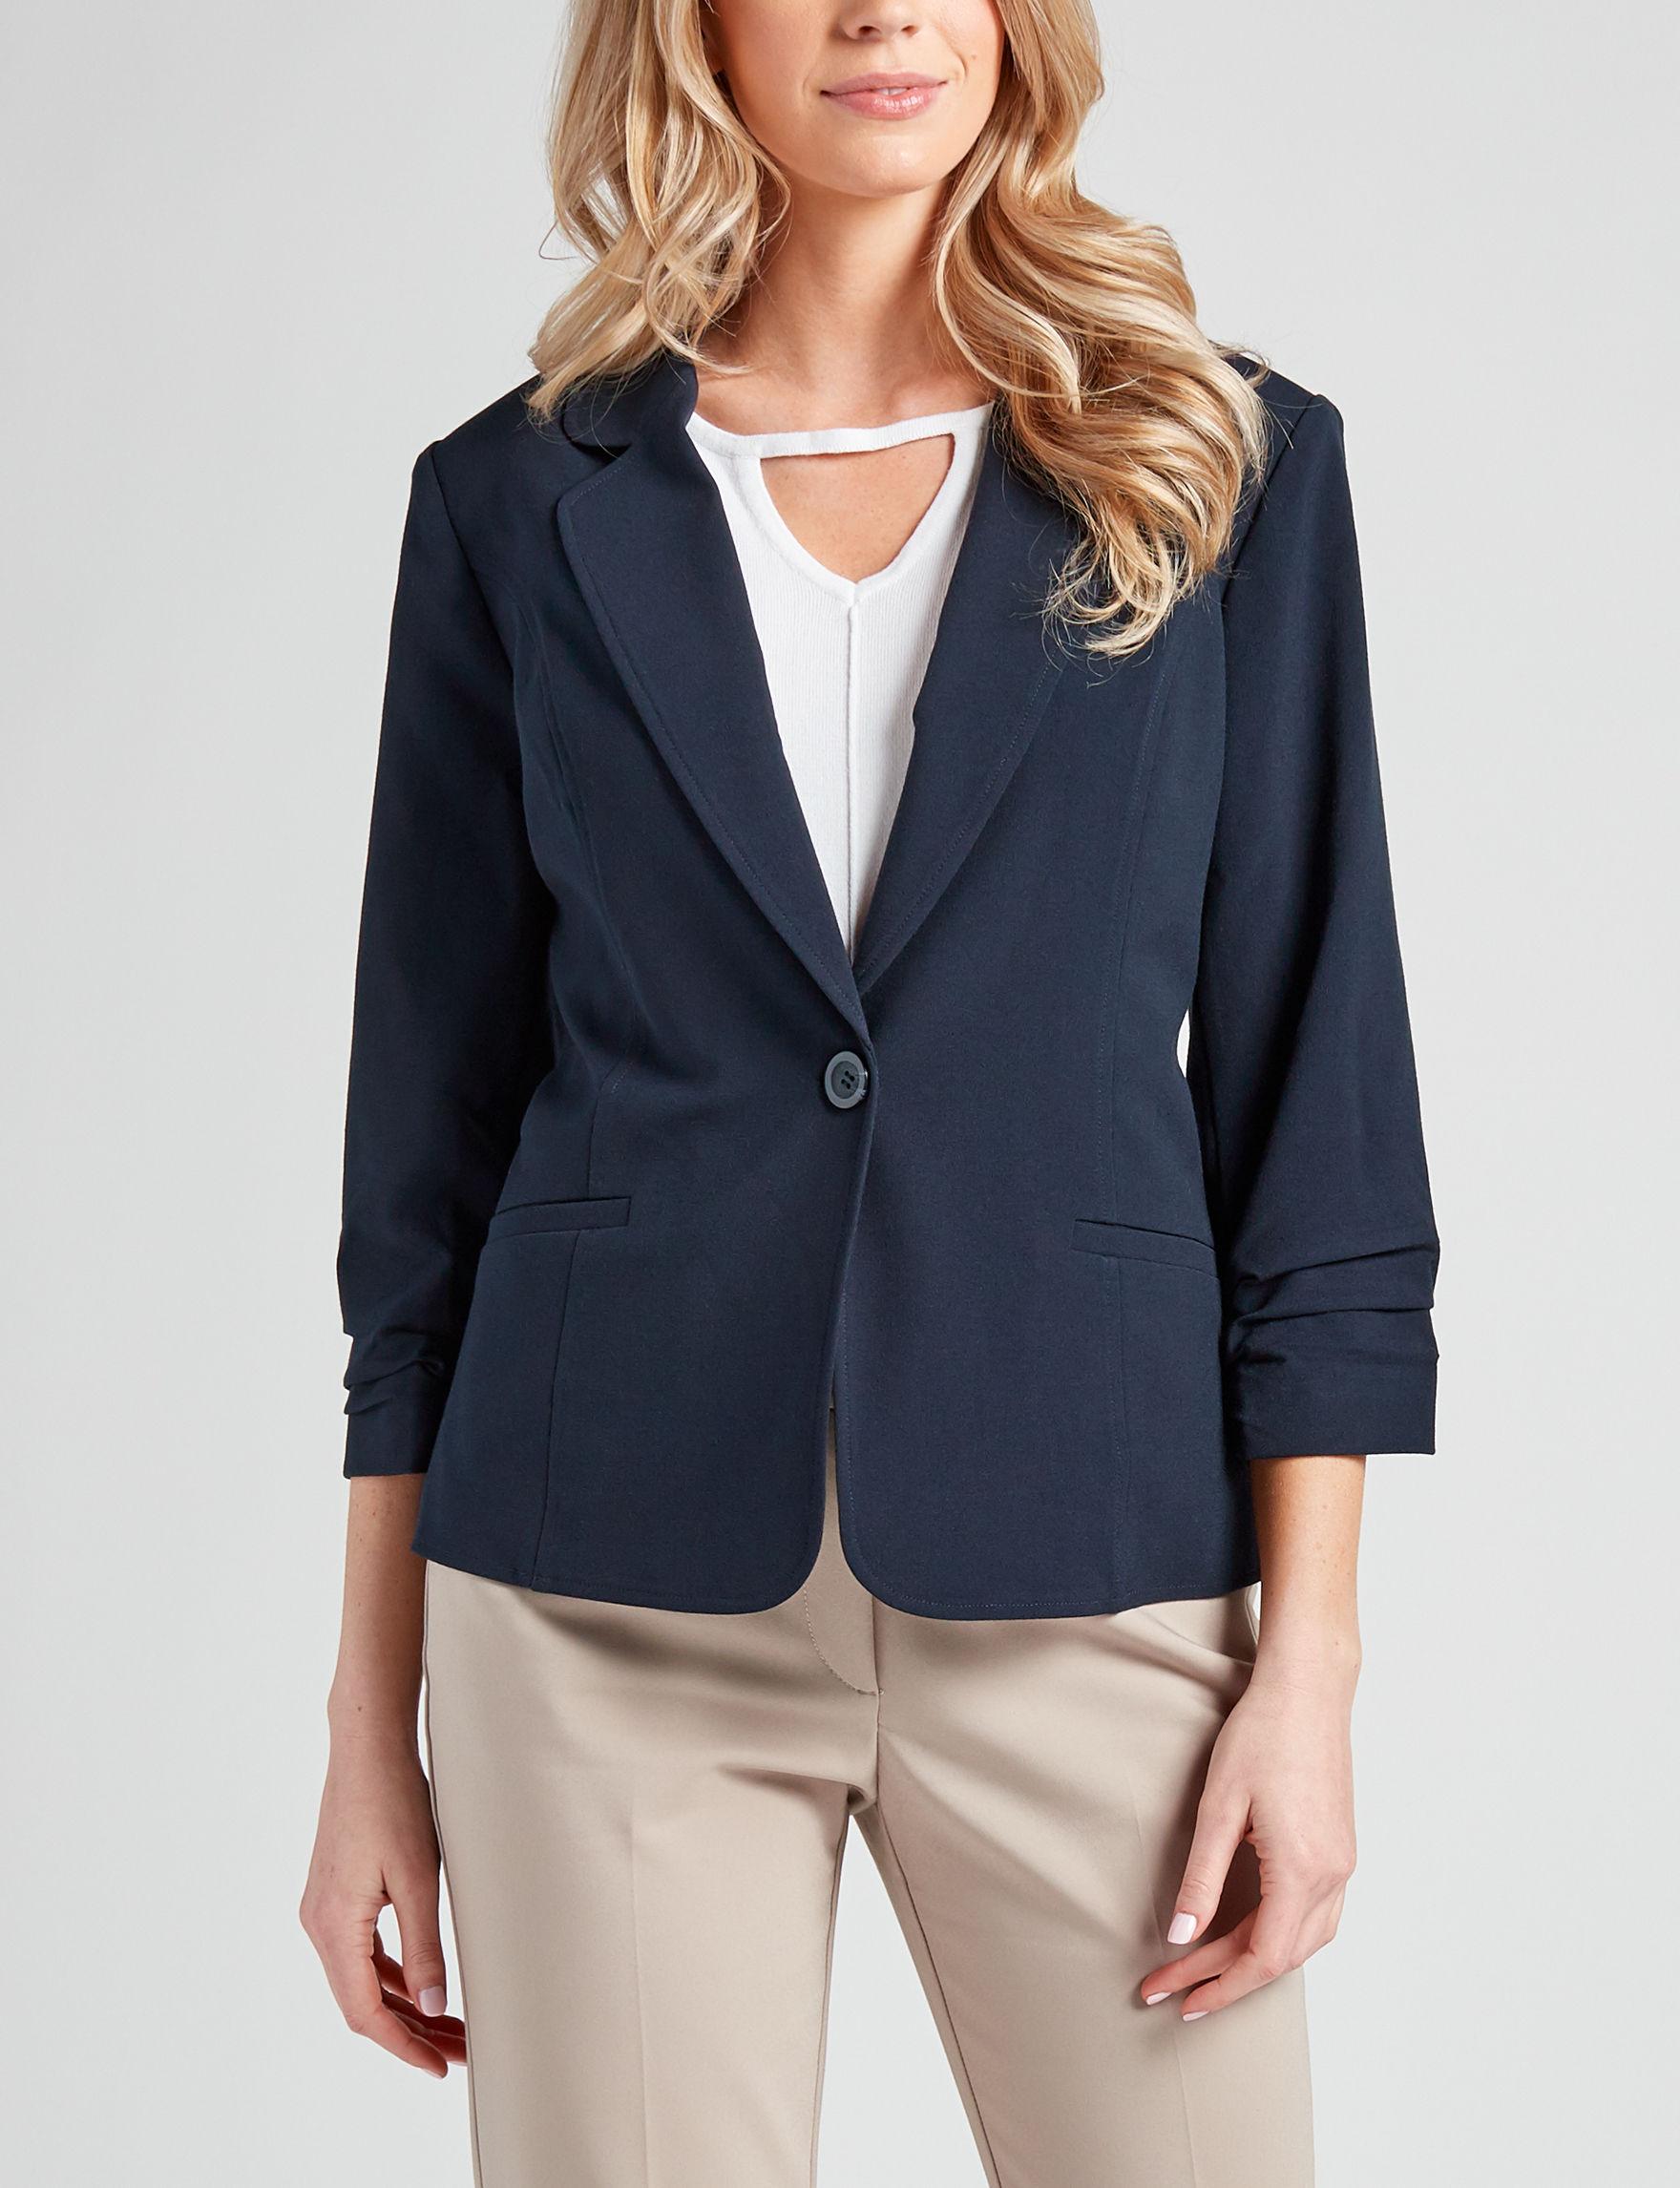 Valerie Stevens Navy Lightweight Jackets & Blazers